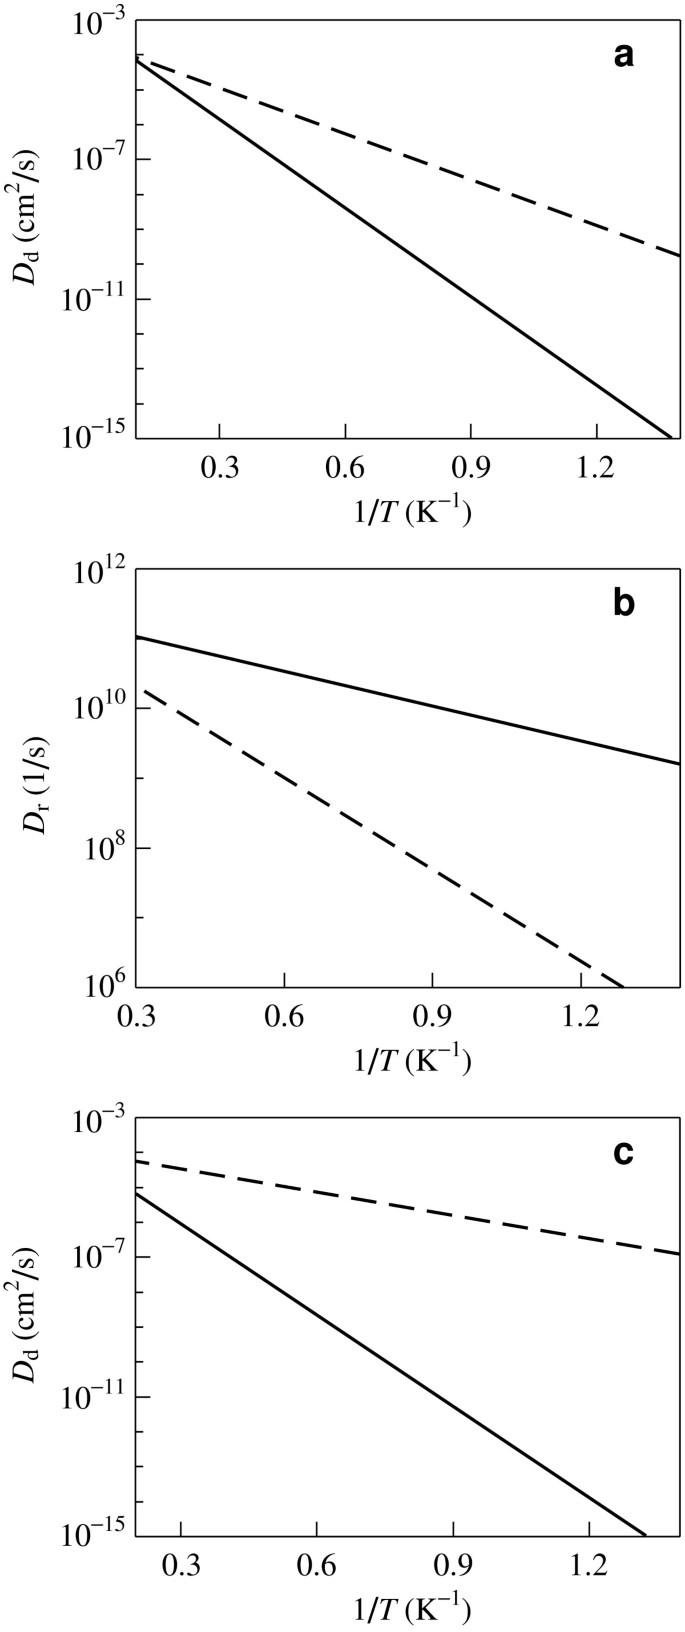 Effect of Peierls transition in armchair carbon nanotube on